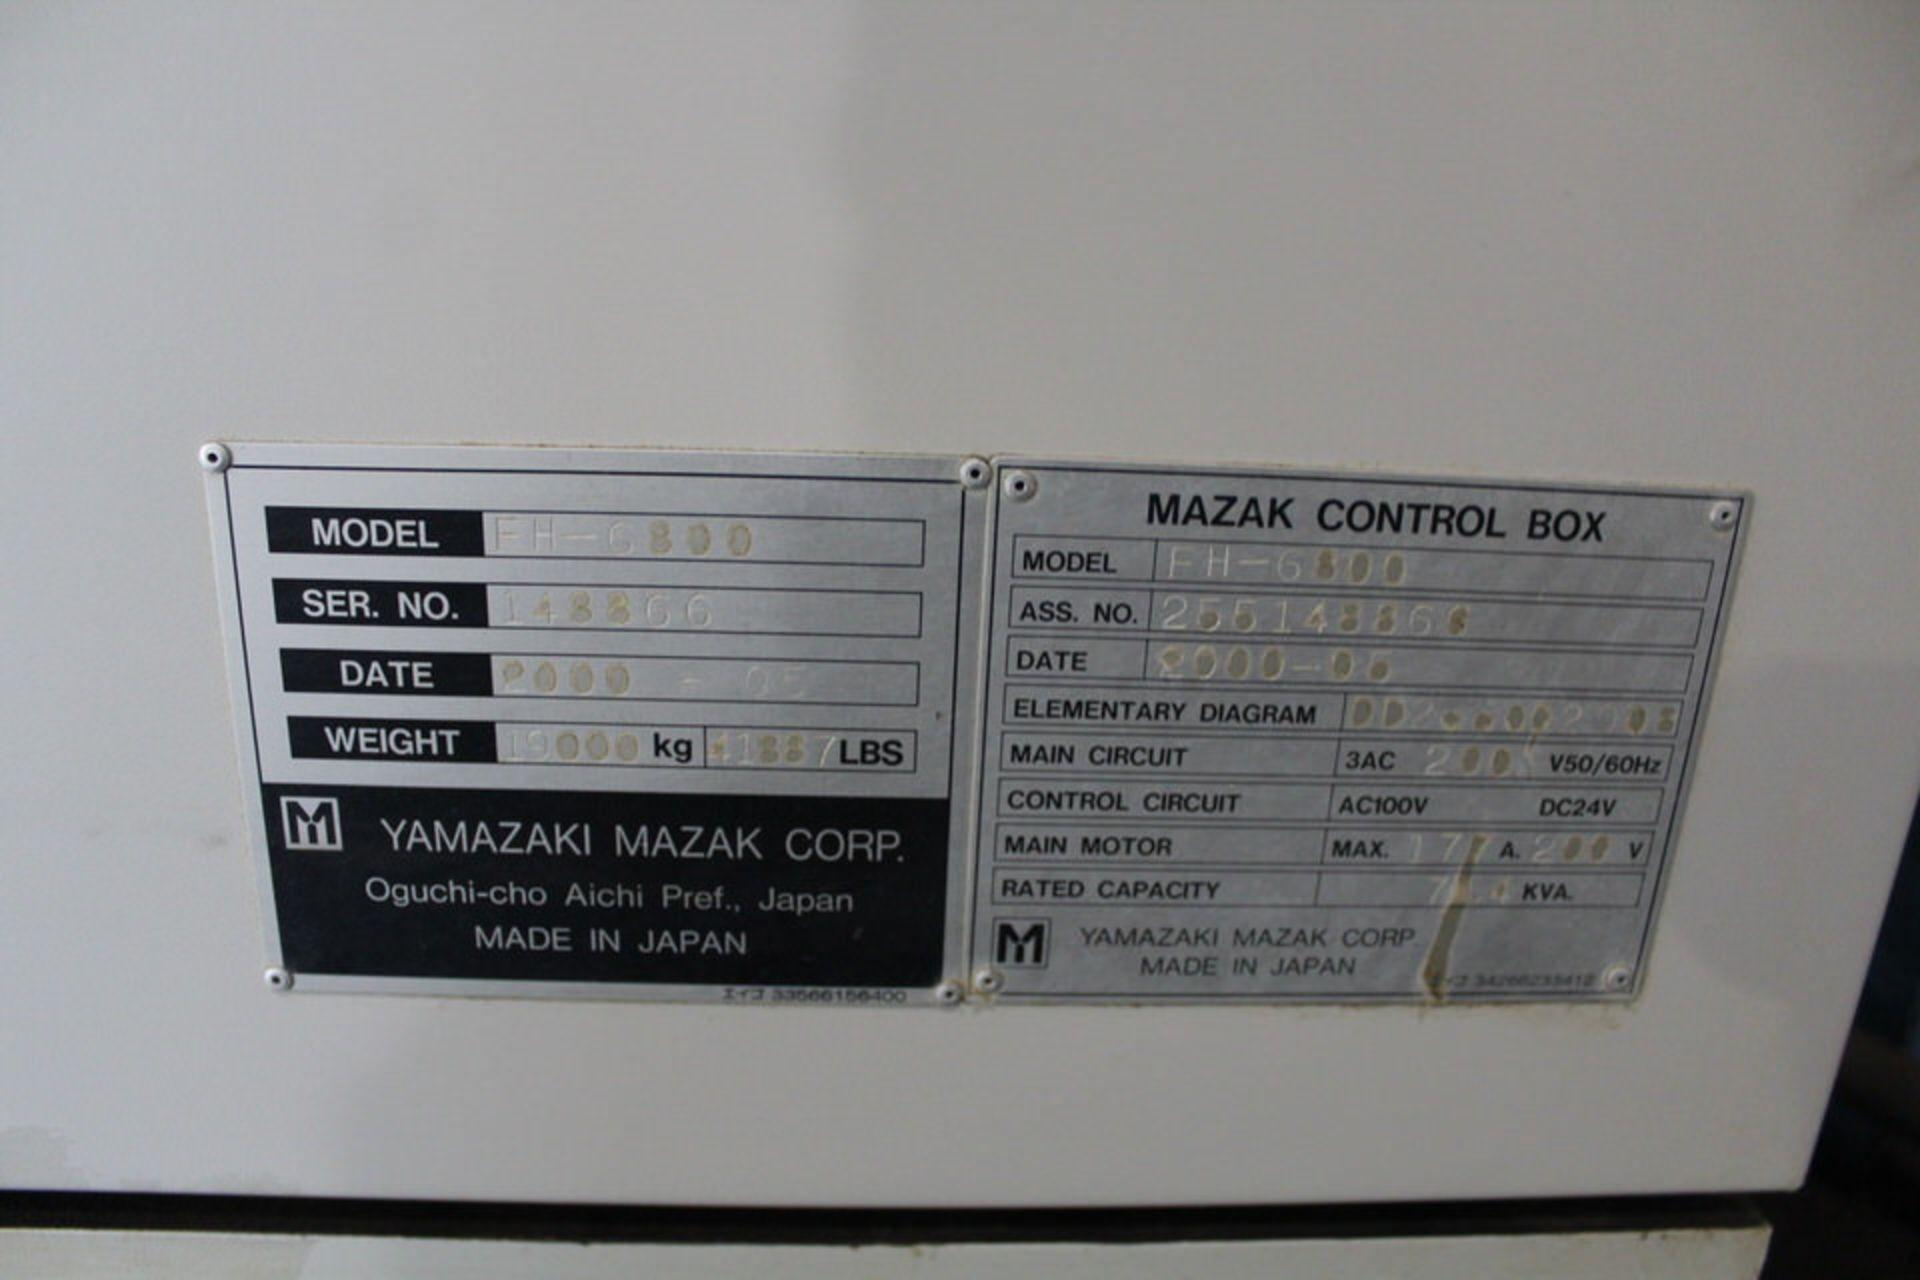 Lot 10 - 2000 MAZAK FH 6800 HMC